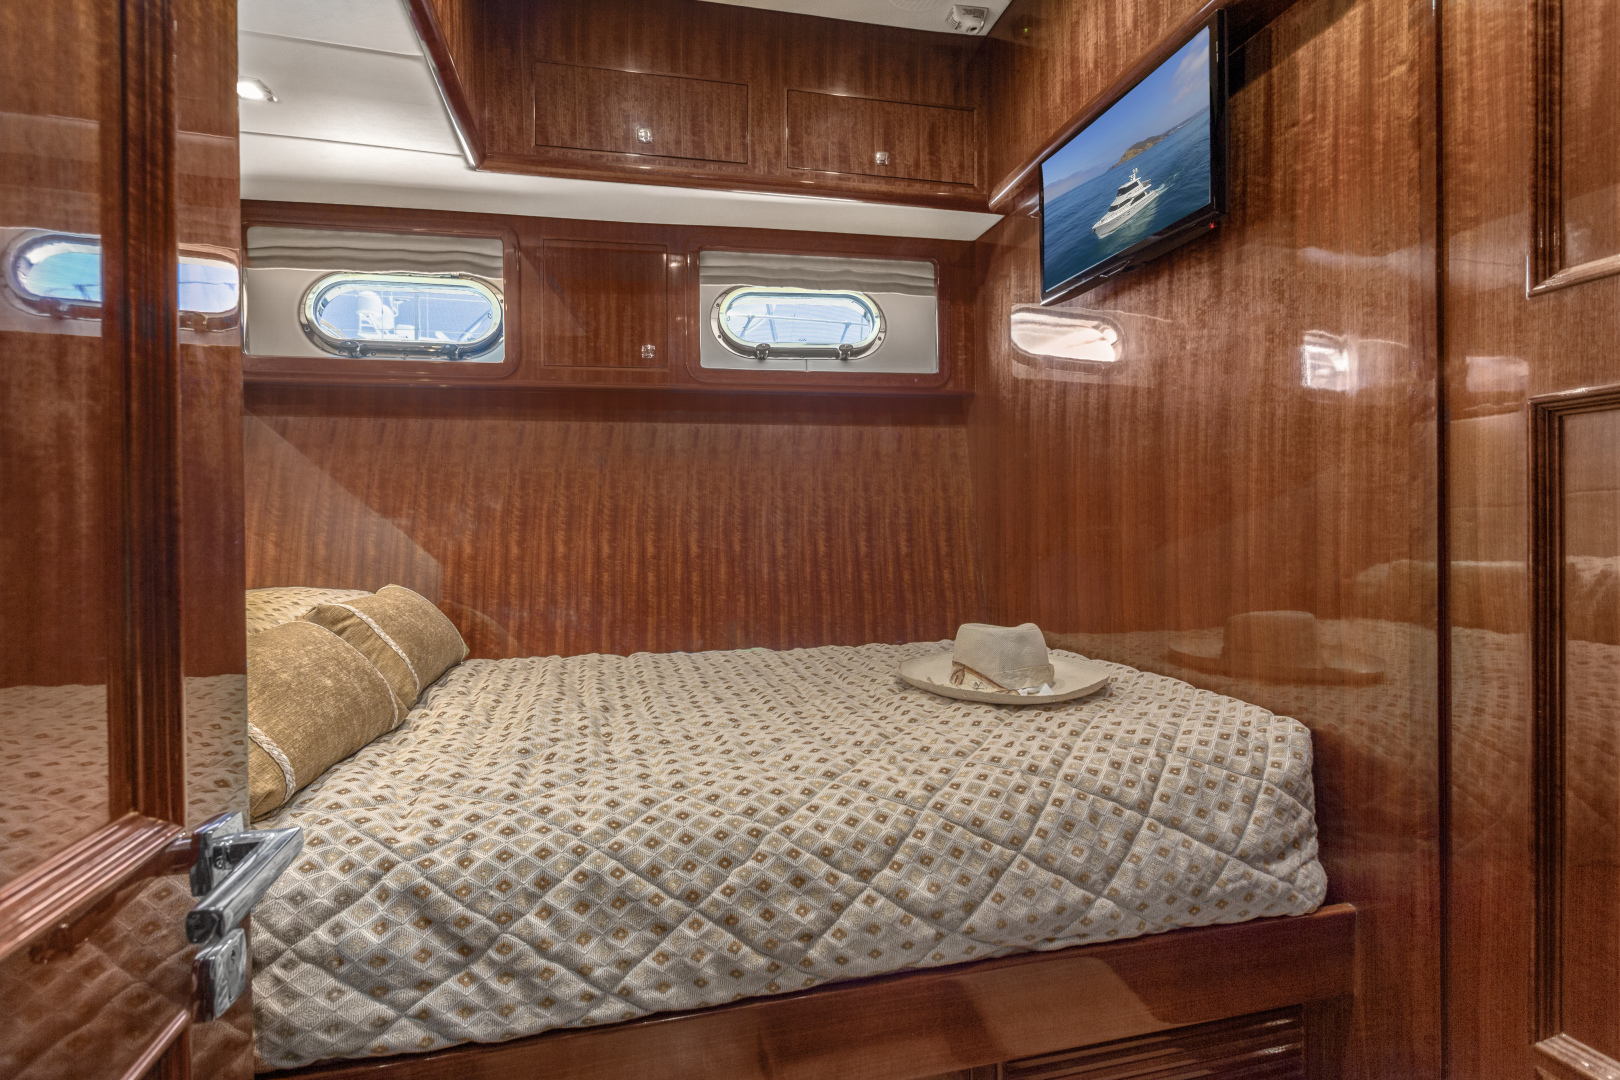 Hampton-76 Skylounge Motoryacht 2014-ODYSEA San Diego-California-United States-GUEST STATEROOM-1165169 | Thumbnail